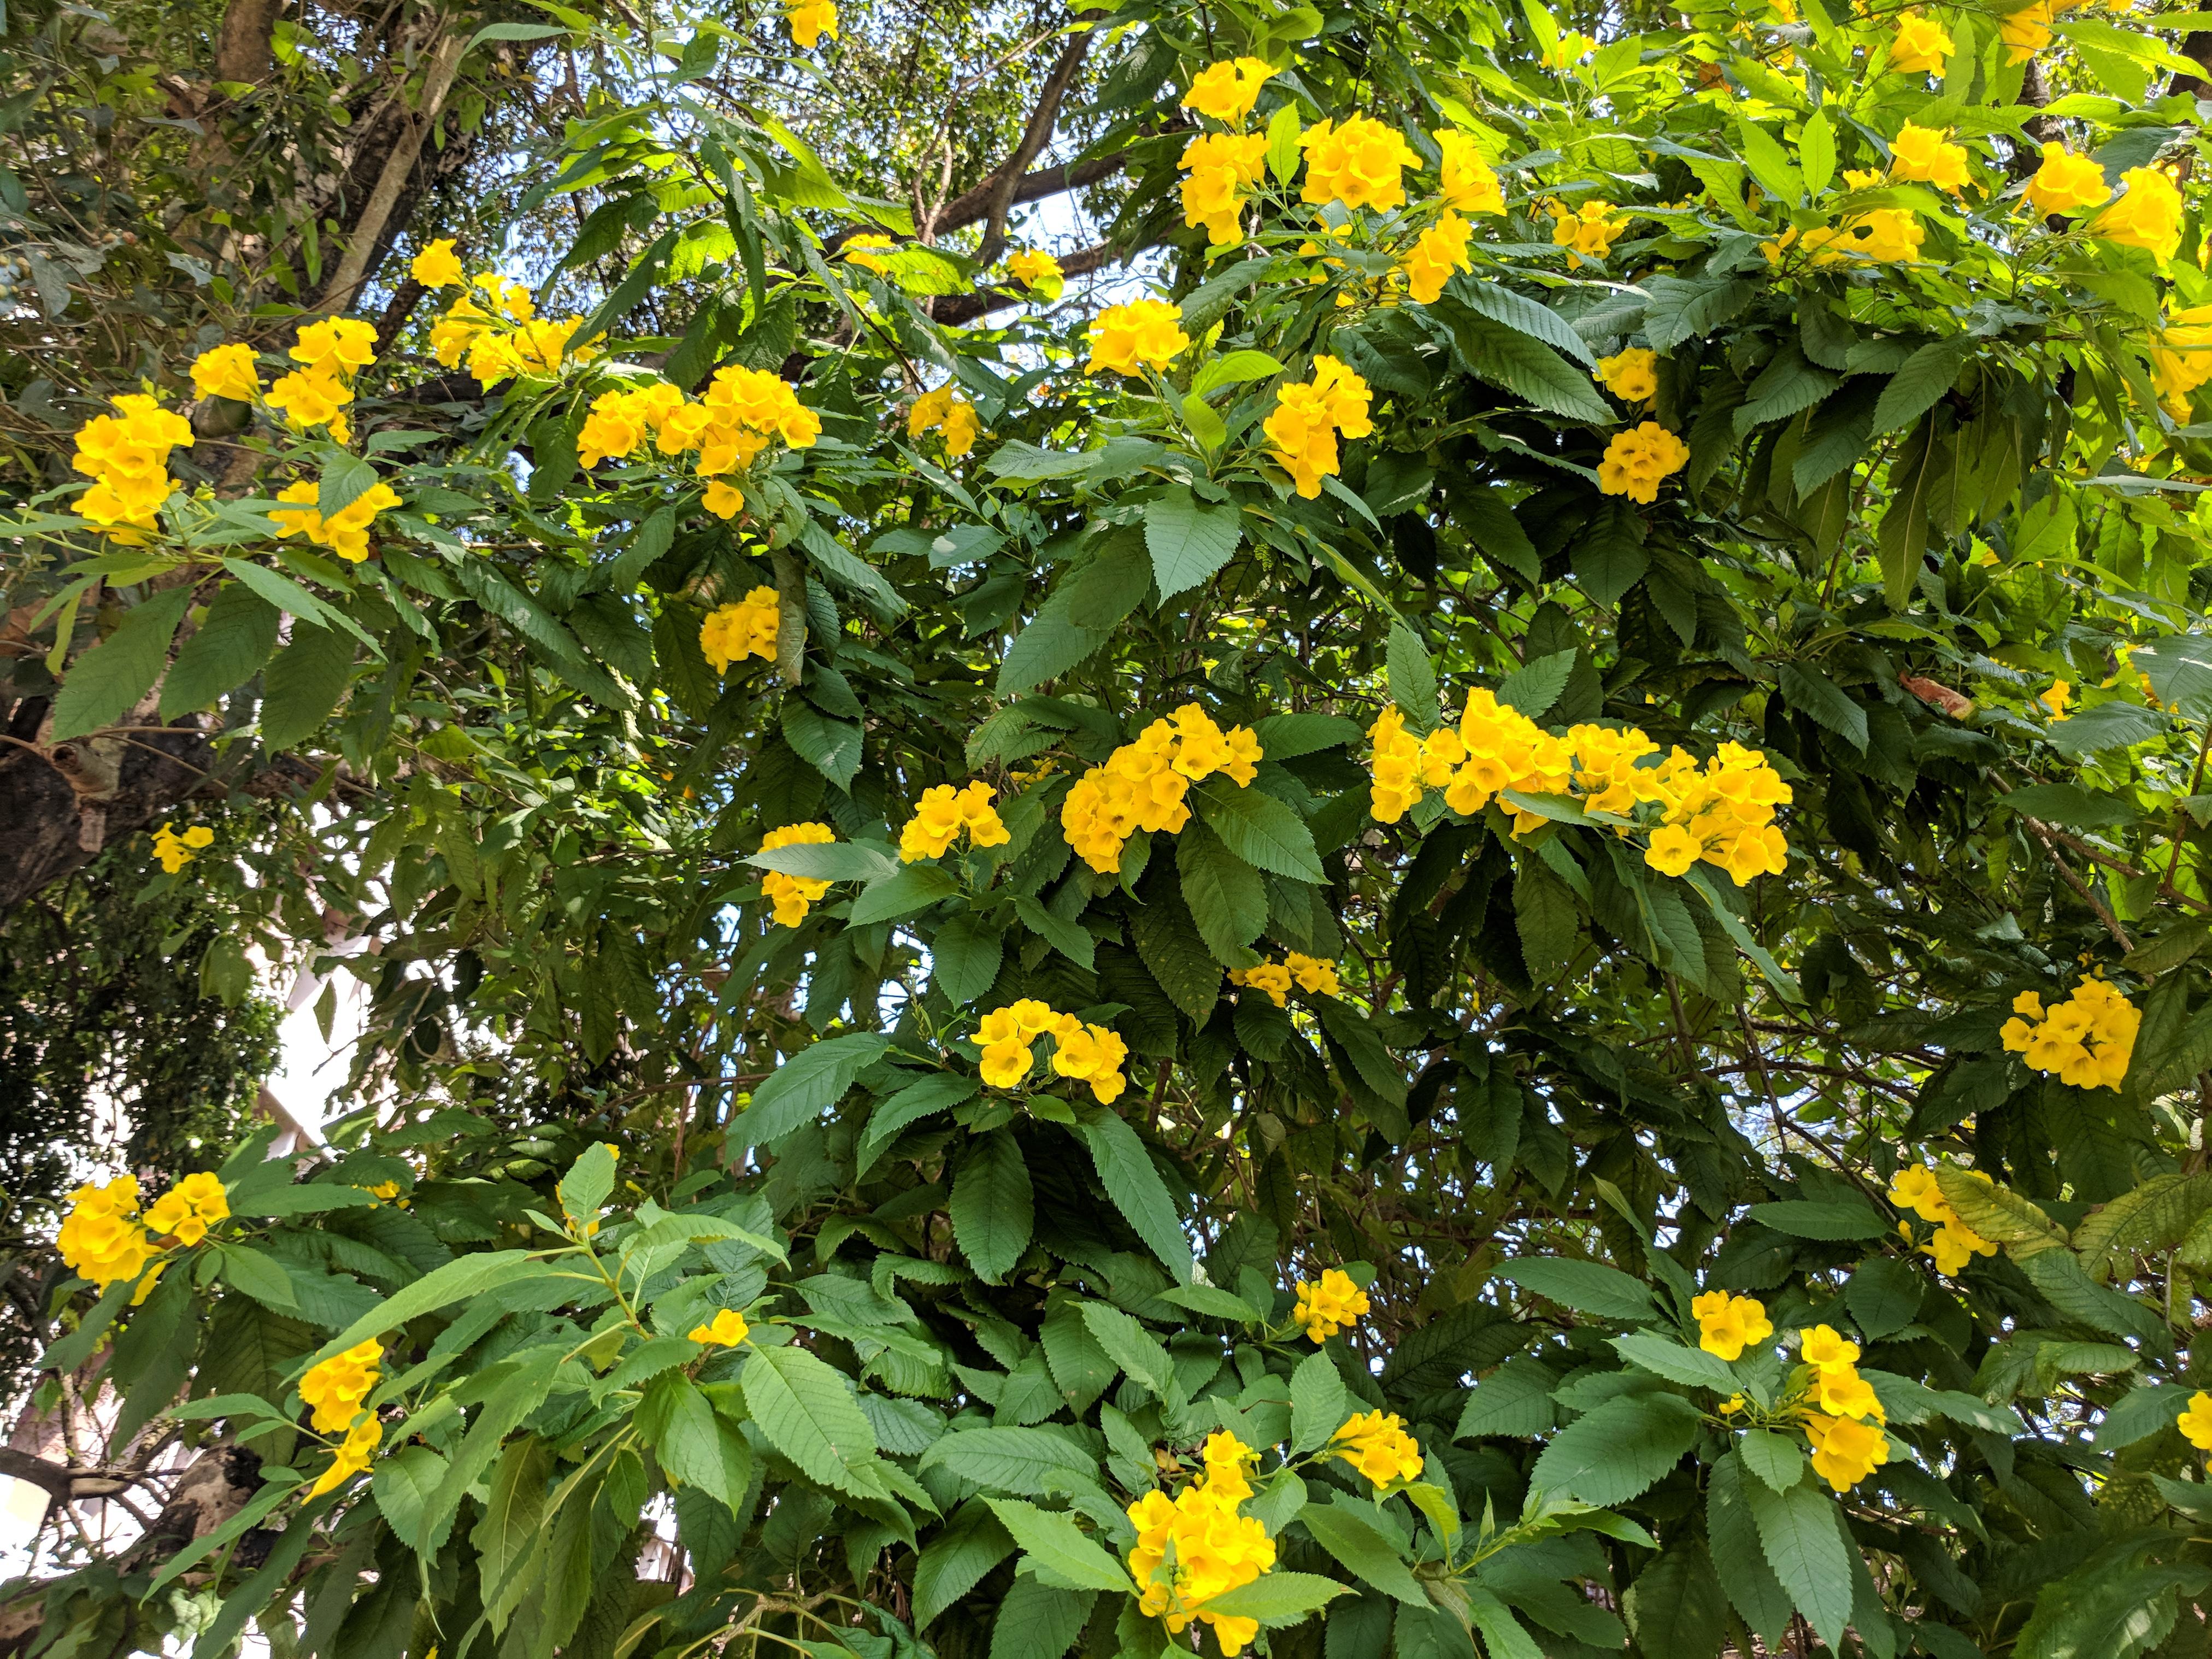 Filetecoma Stans Yellow Bell Flower 31g Wikimedia Commons